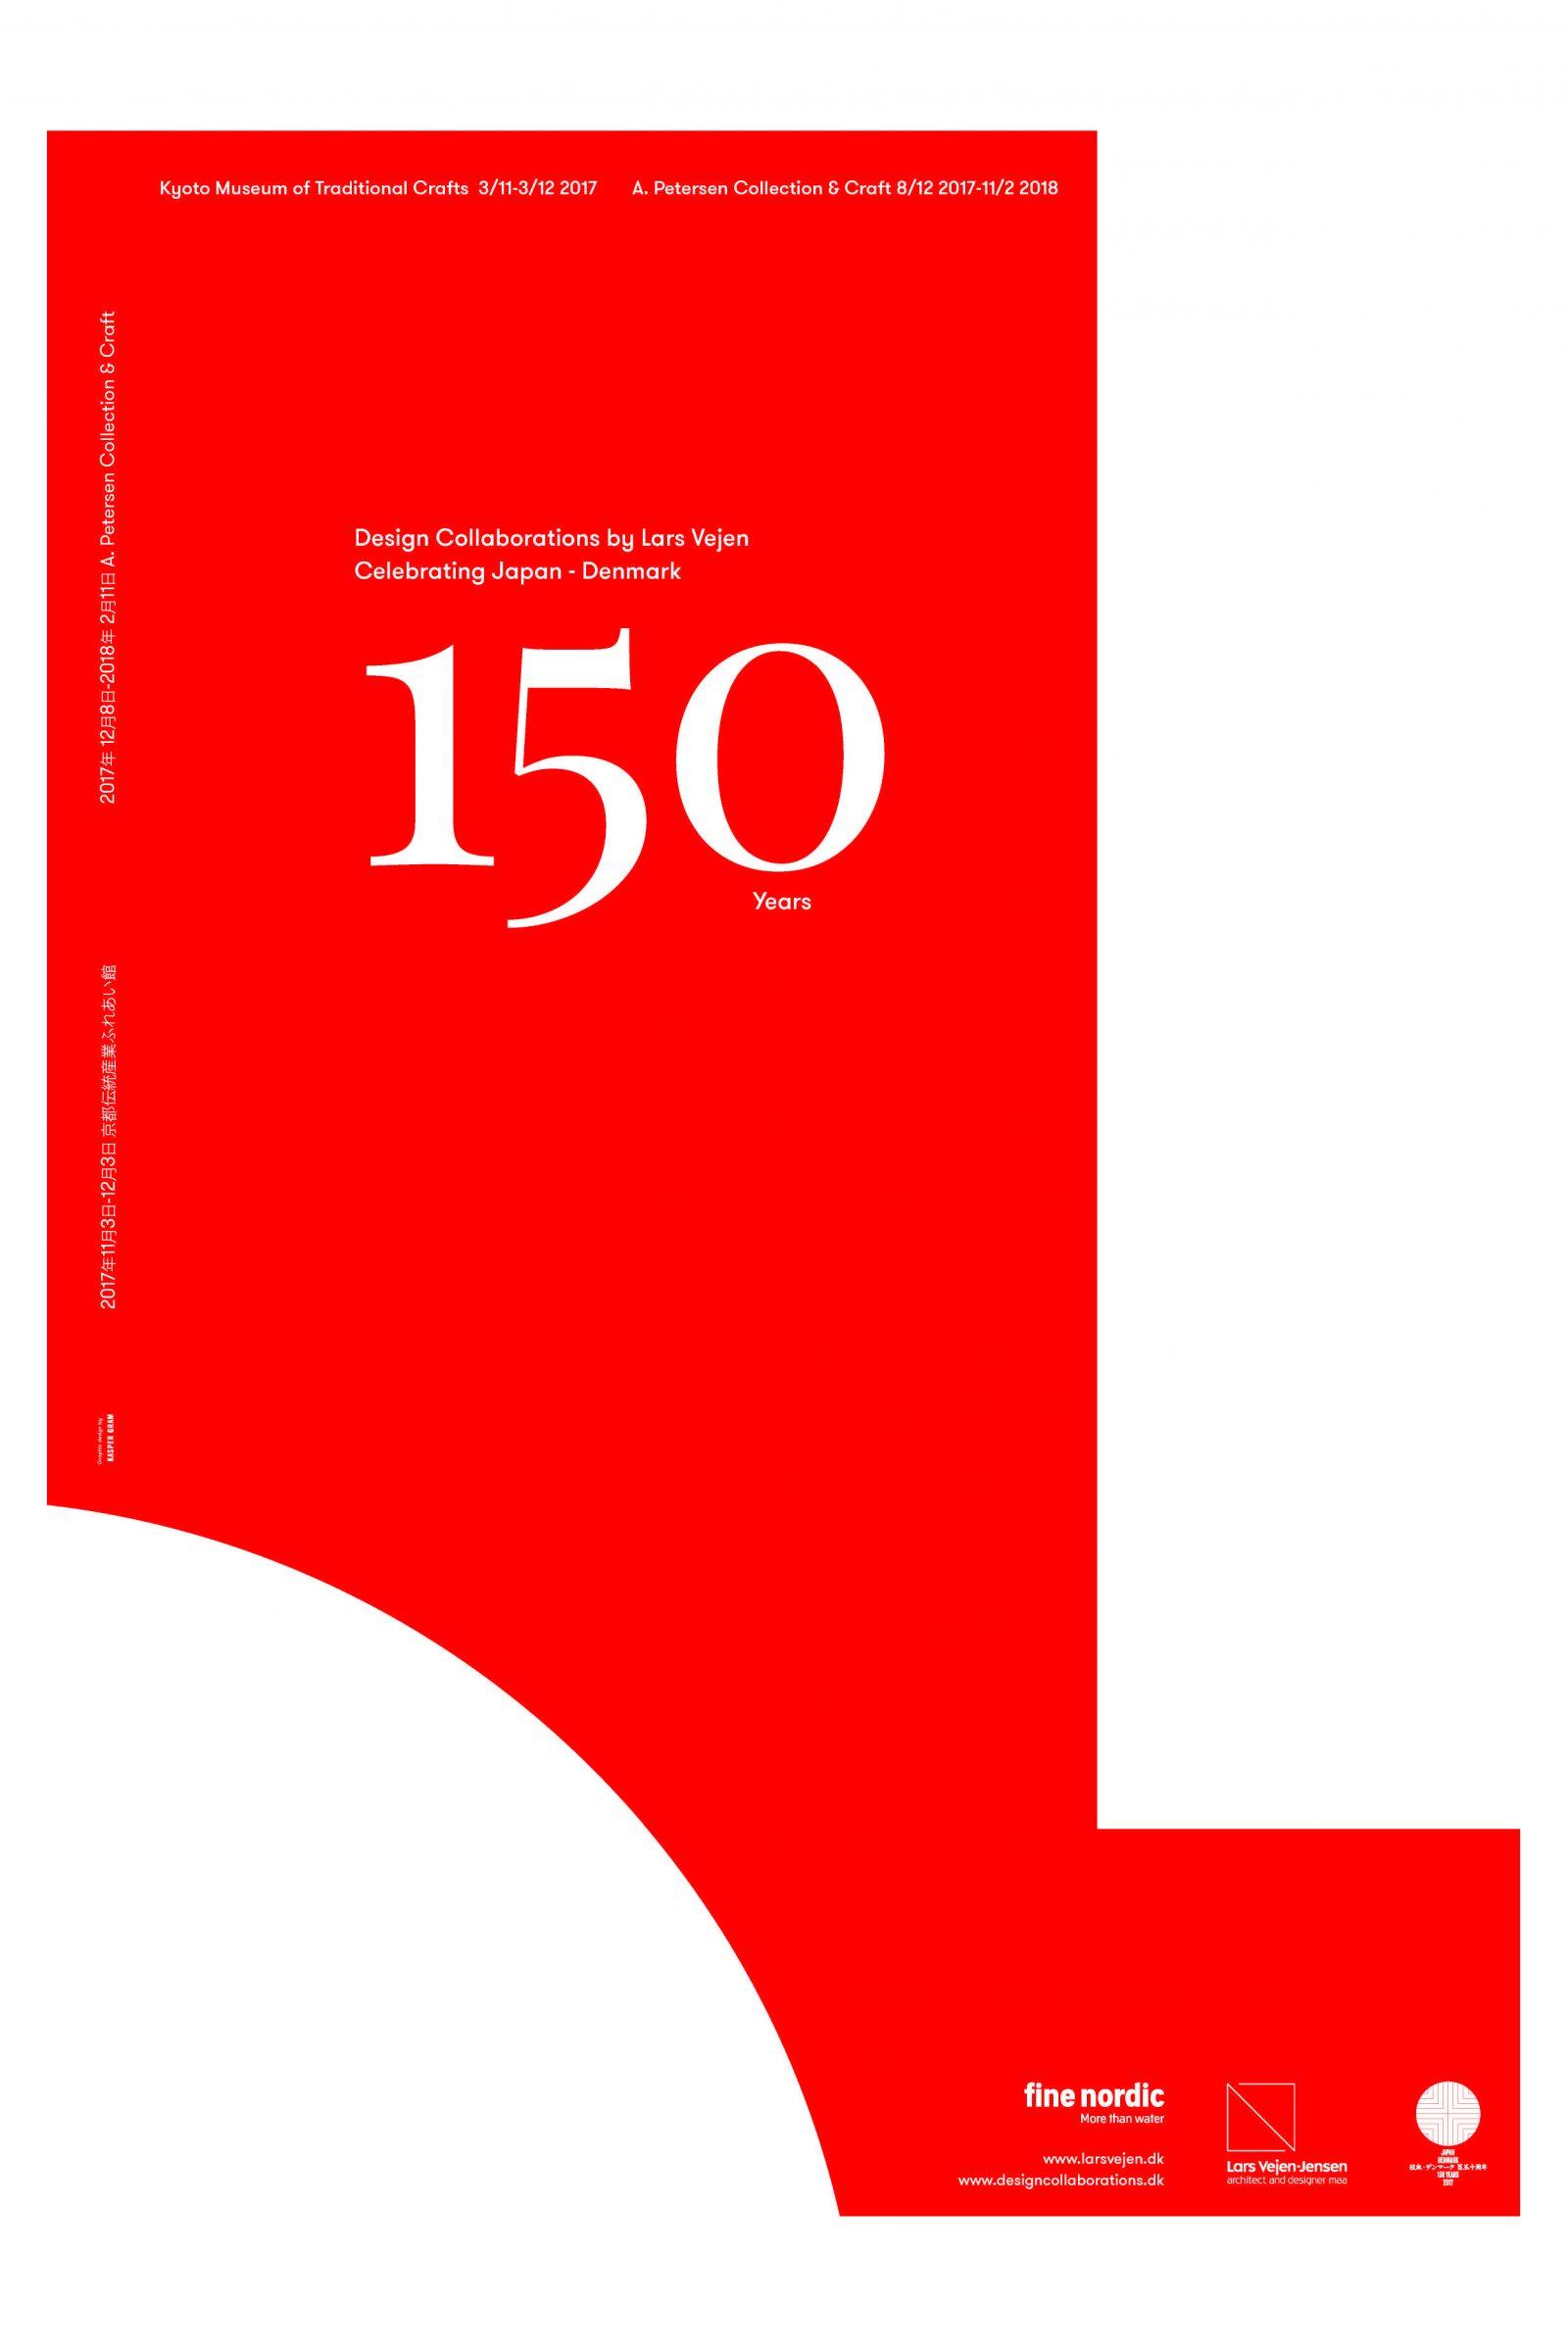 DKJP 150 by Lars Vejen exhibition poster 20170913 FINAL copy